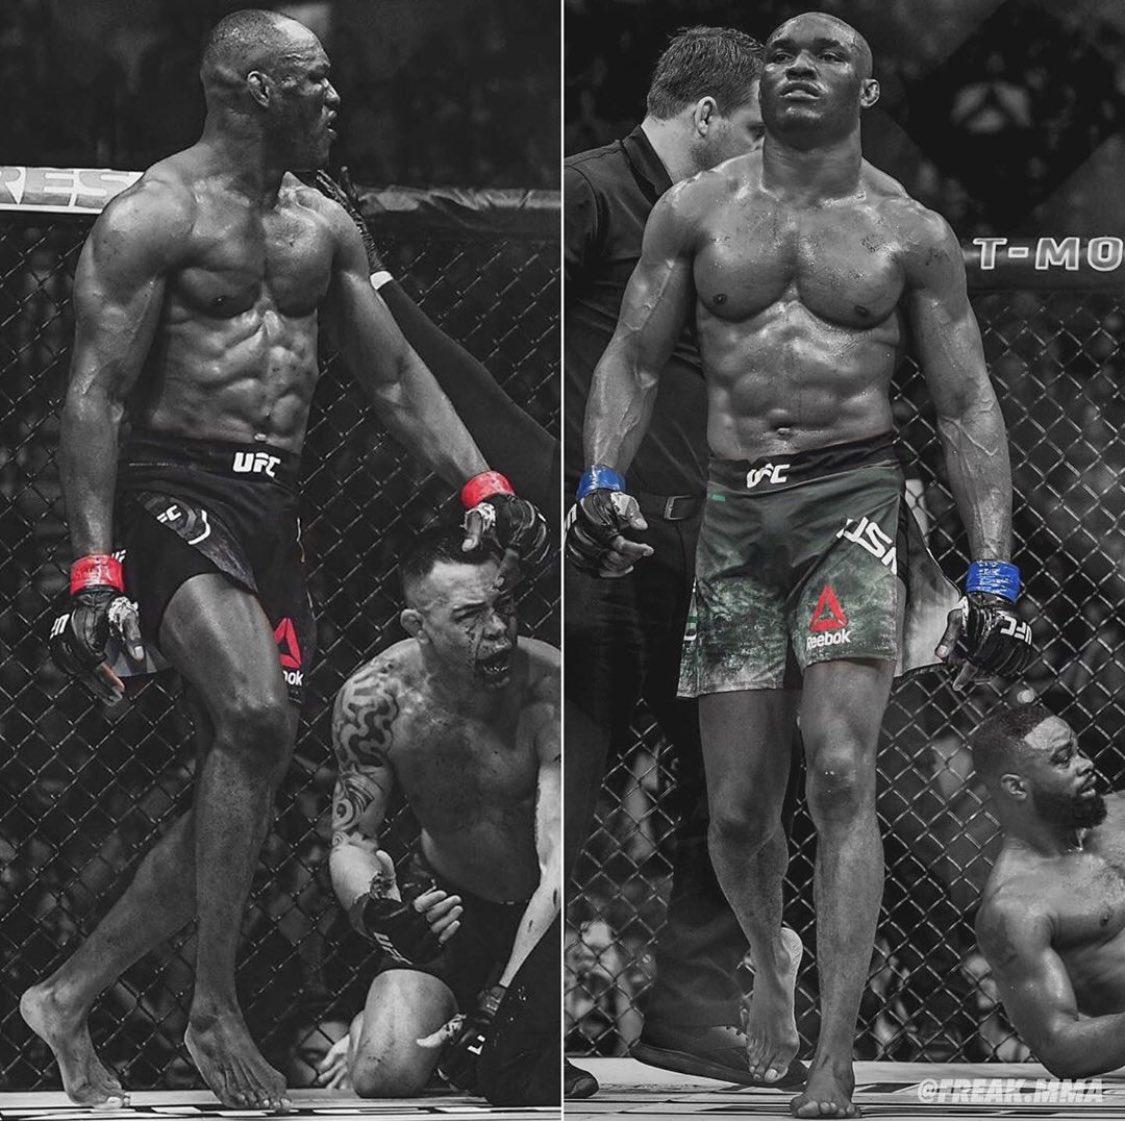 Shmoood 😏👊🏿🇳🇬 #UFC251 https://t.co/xSExxWEuVp